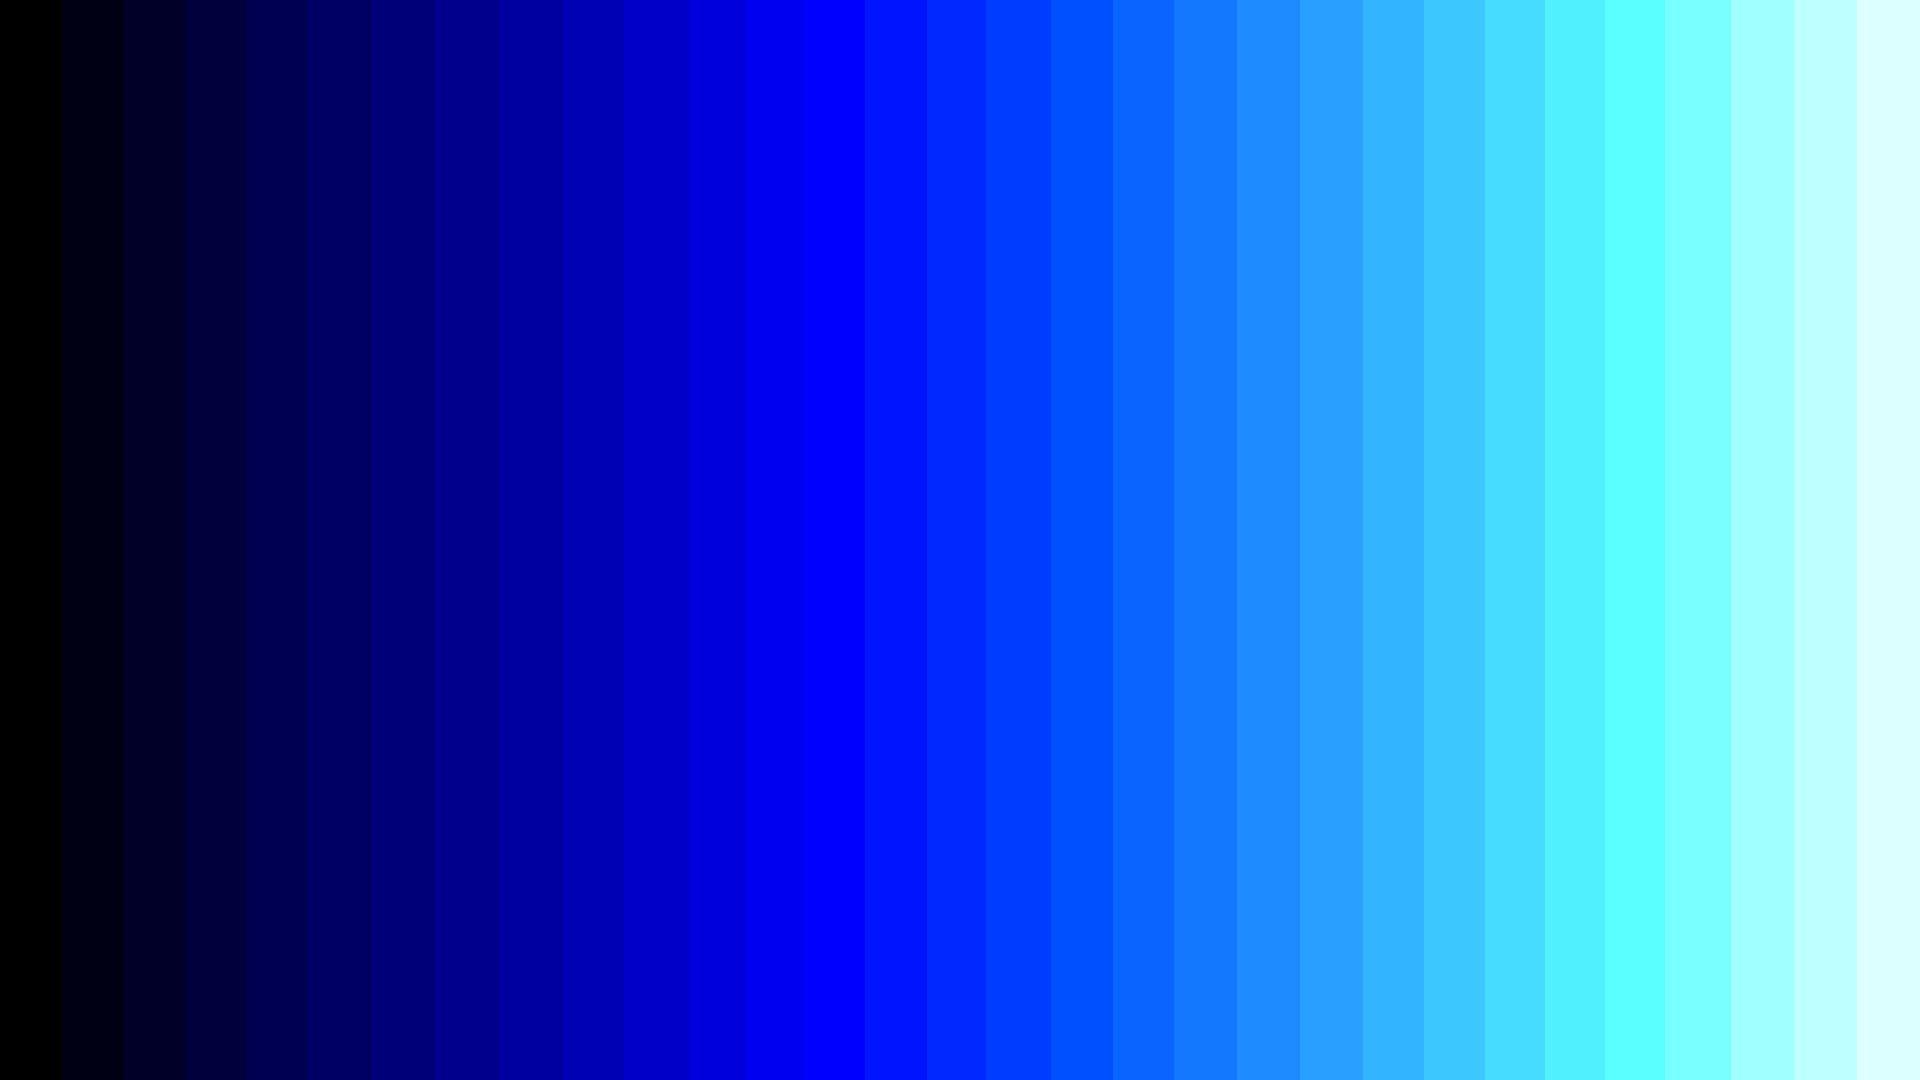 blue color wallpaper 5 24357 for your desktop wallpaper | creative